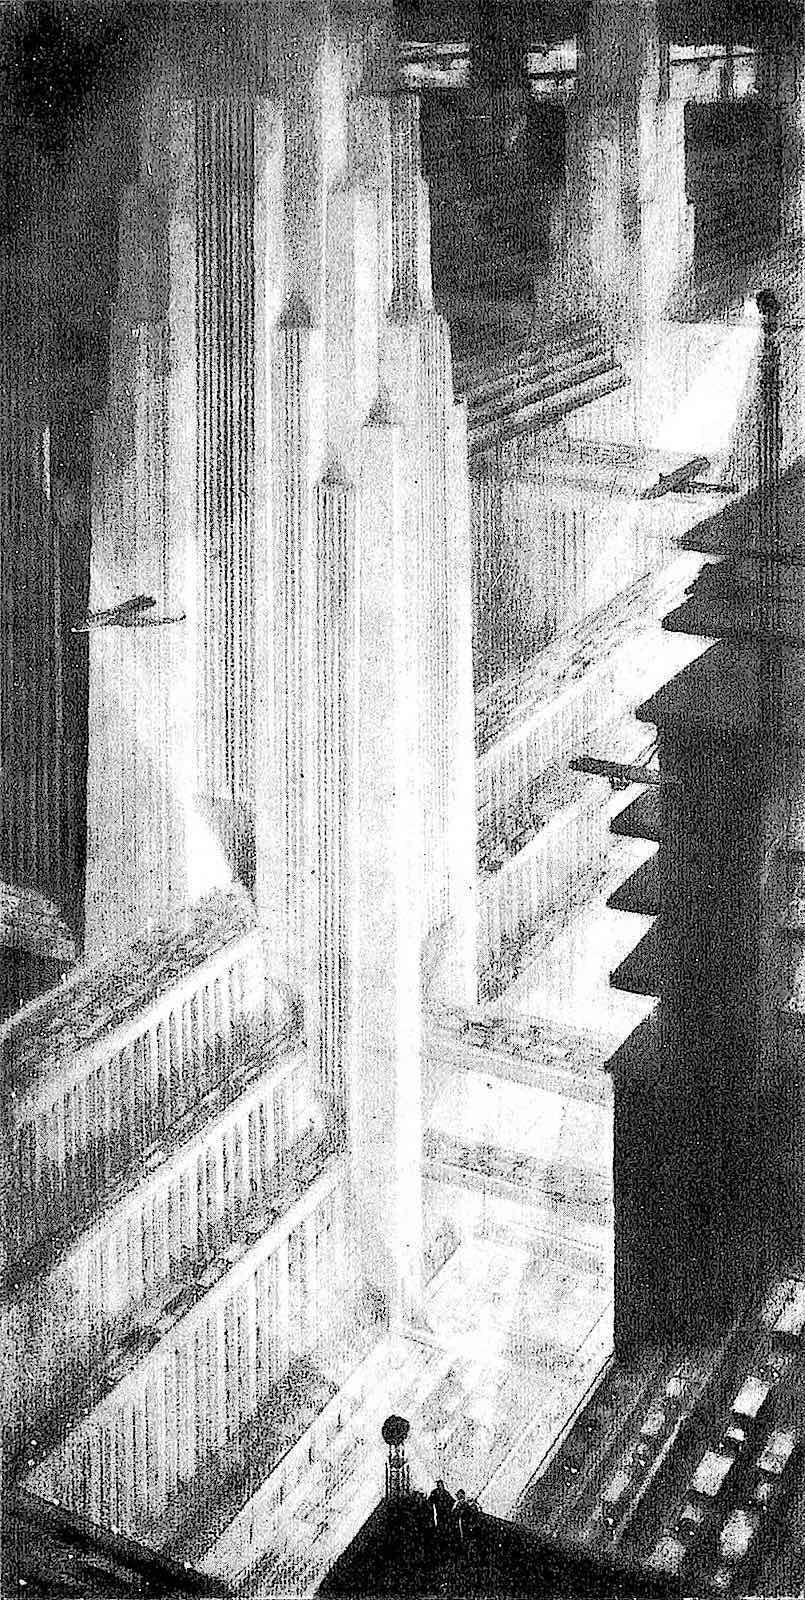 a Hugh Ferriss architectural concept 1929, a future city at night